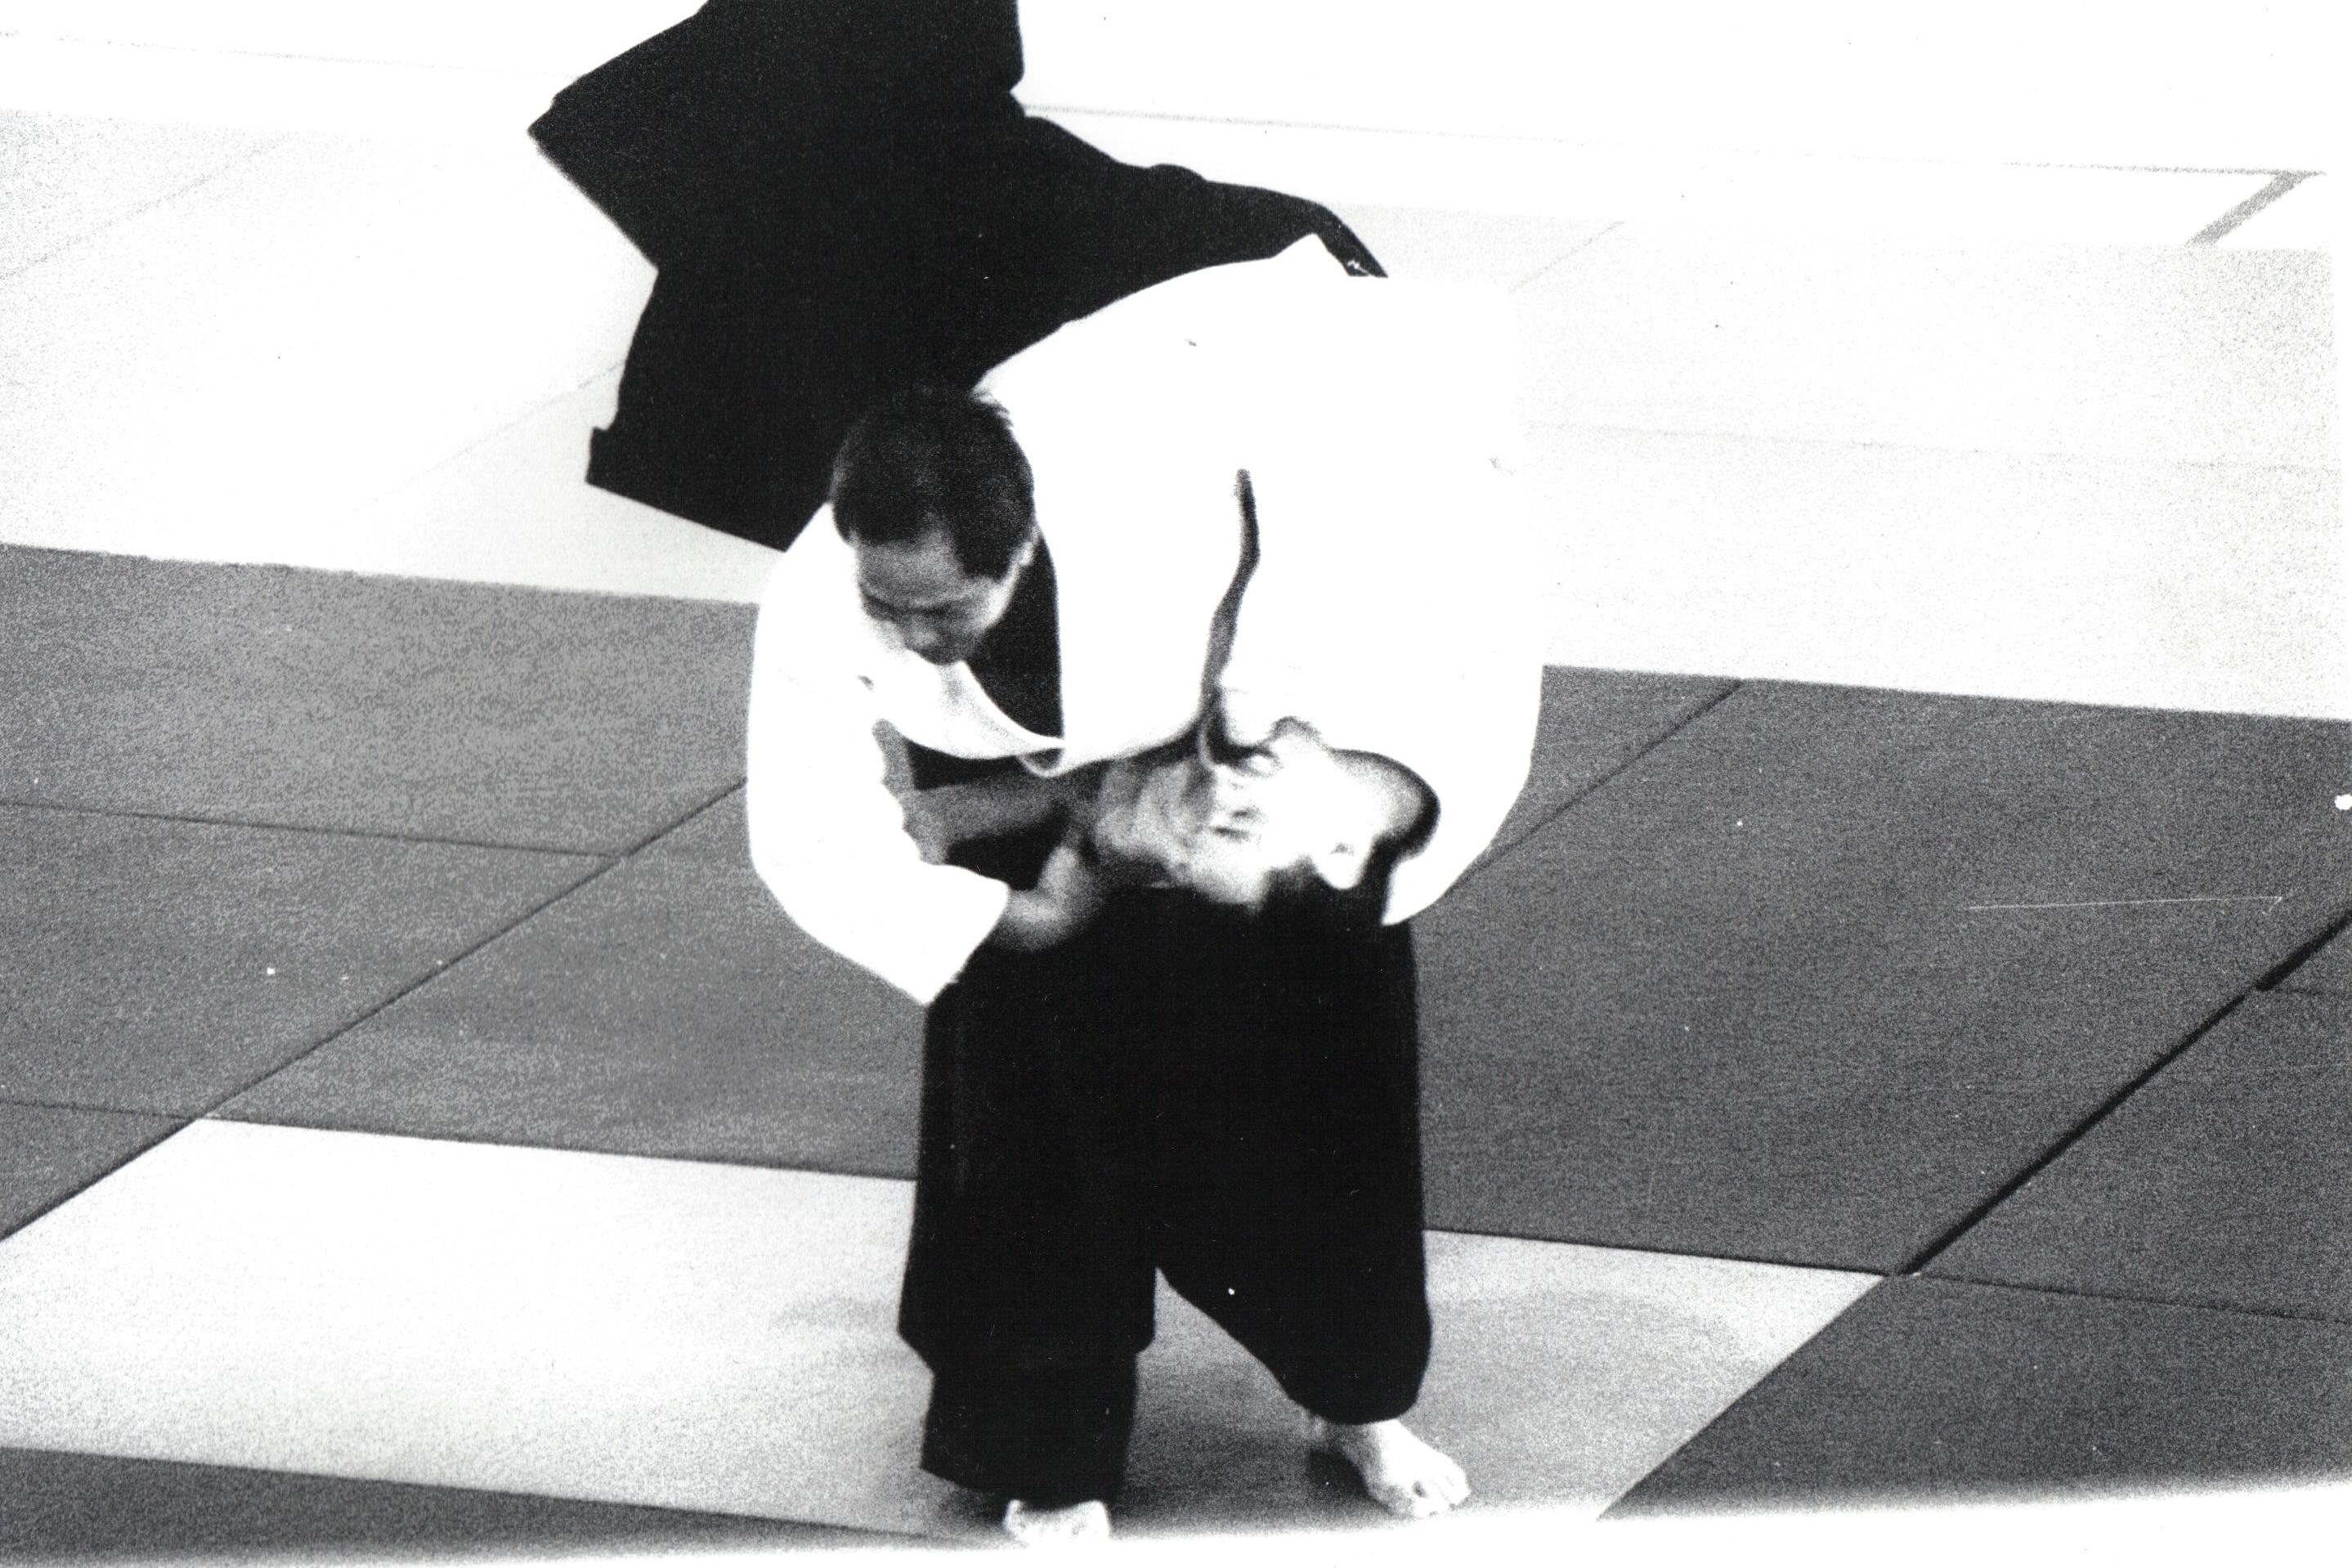 2002 - Sligo - AOI Spring Course 2002 con Yoji Fujimoto